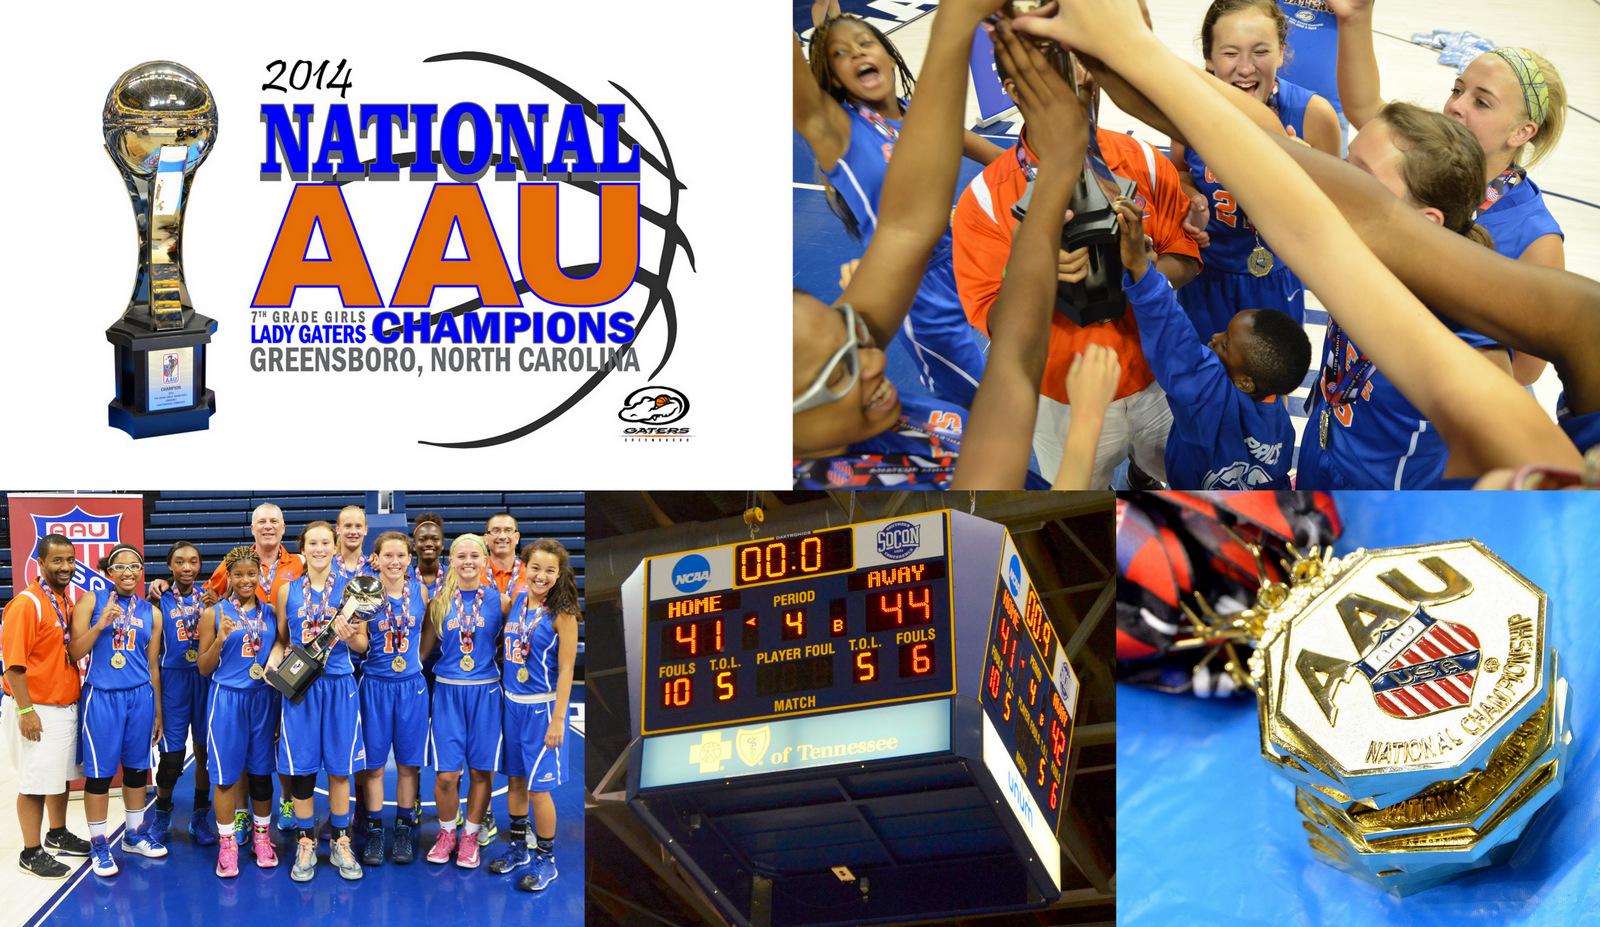 AAU National Champions 2014